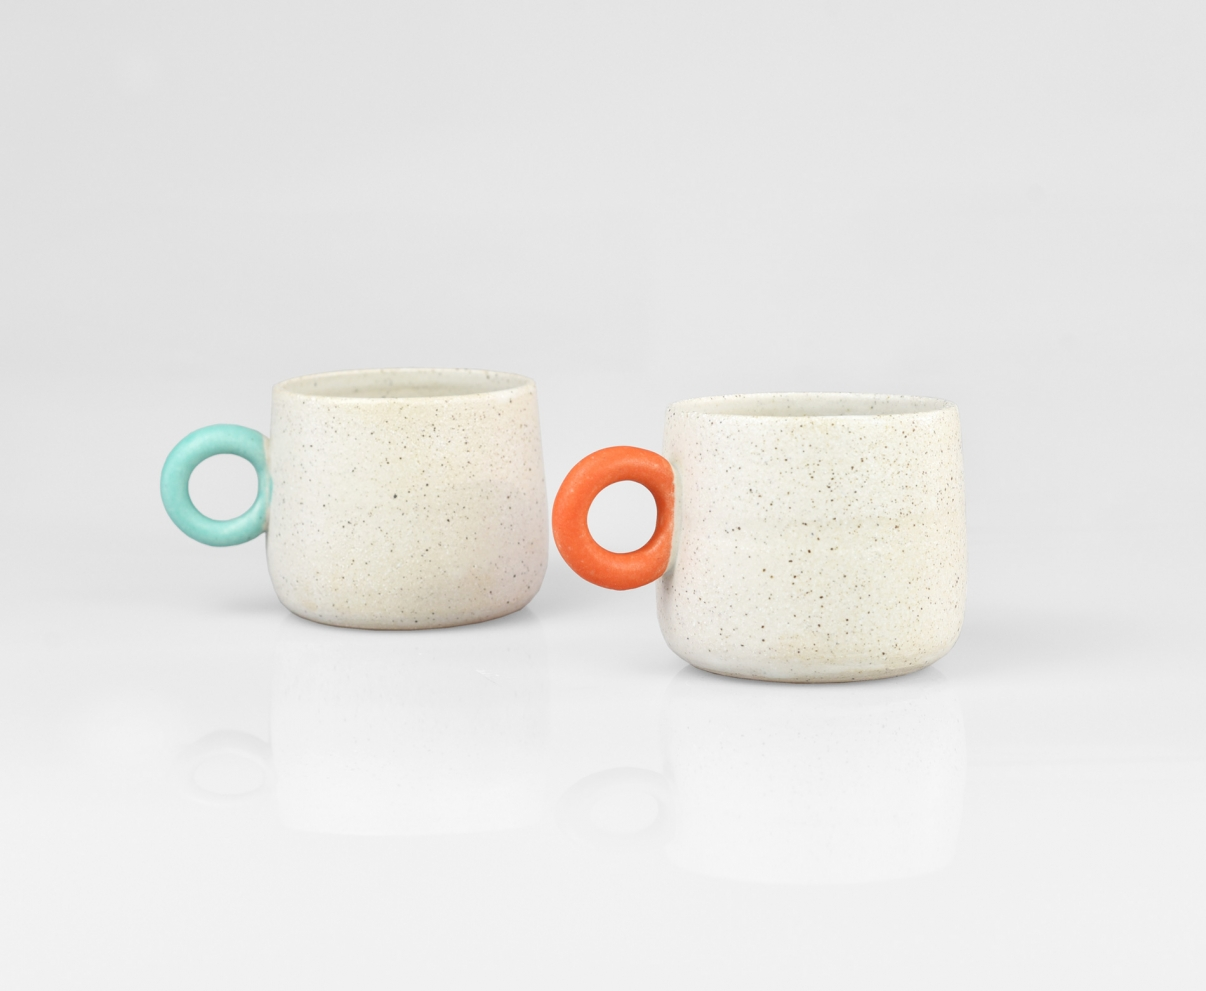 The Coffee Officina mug